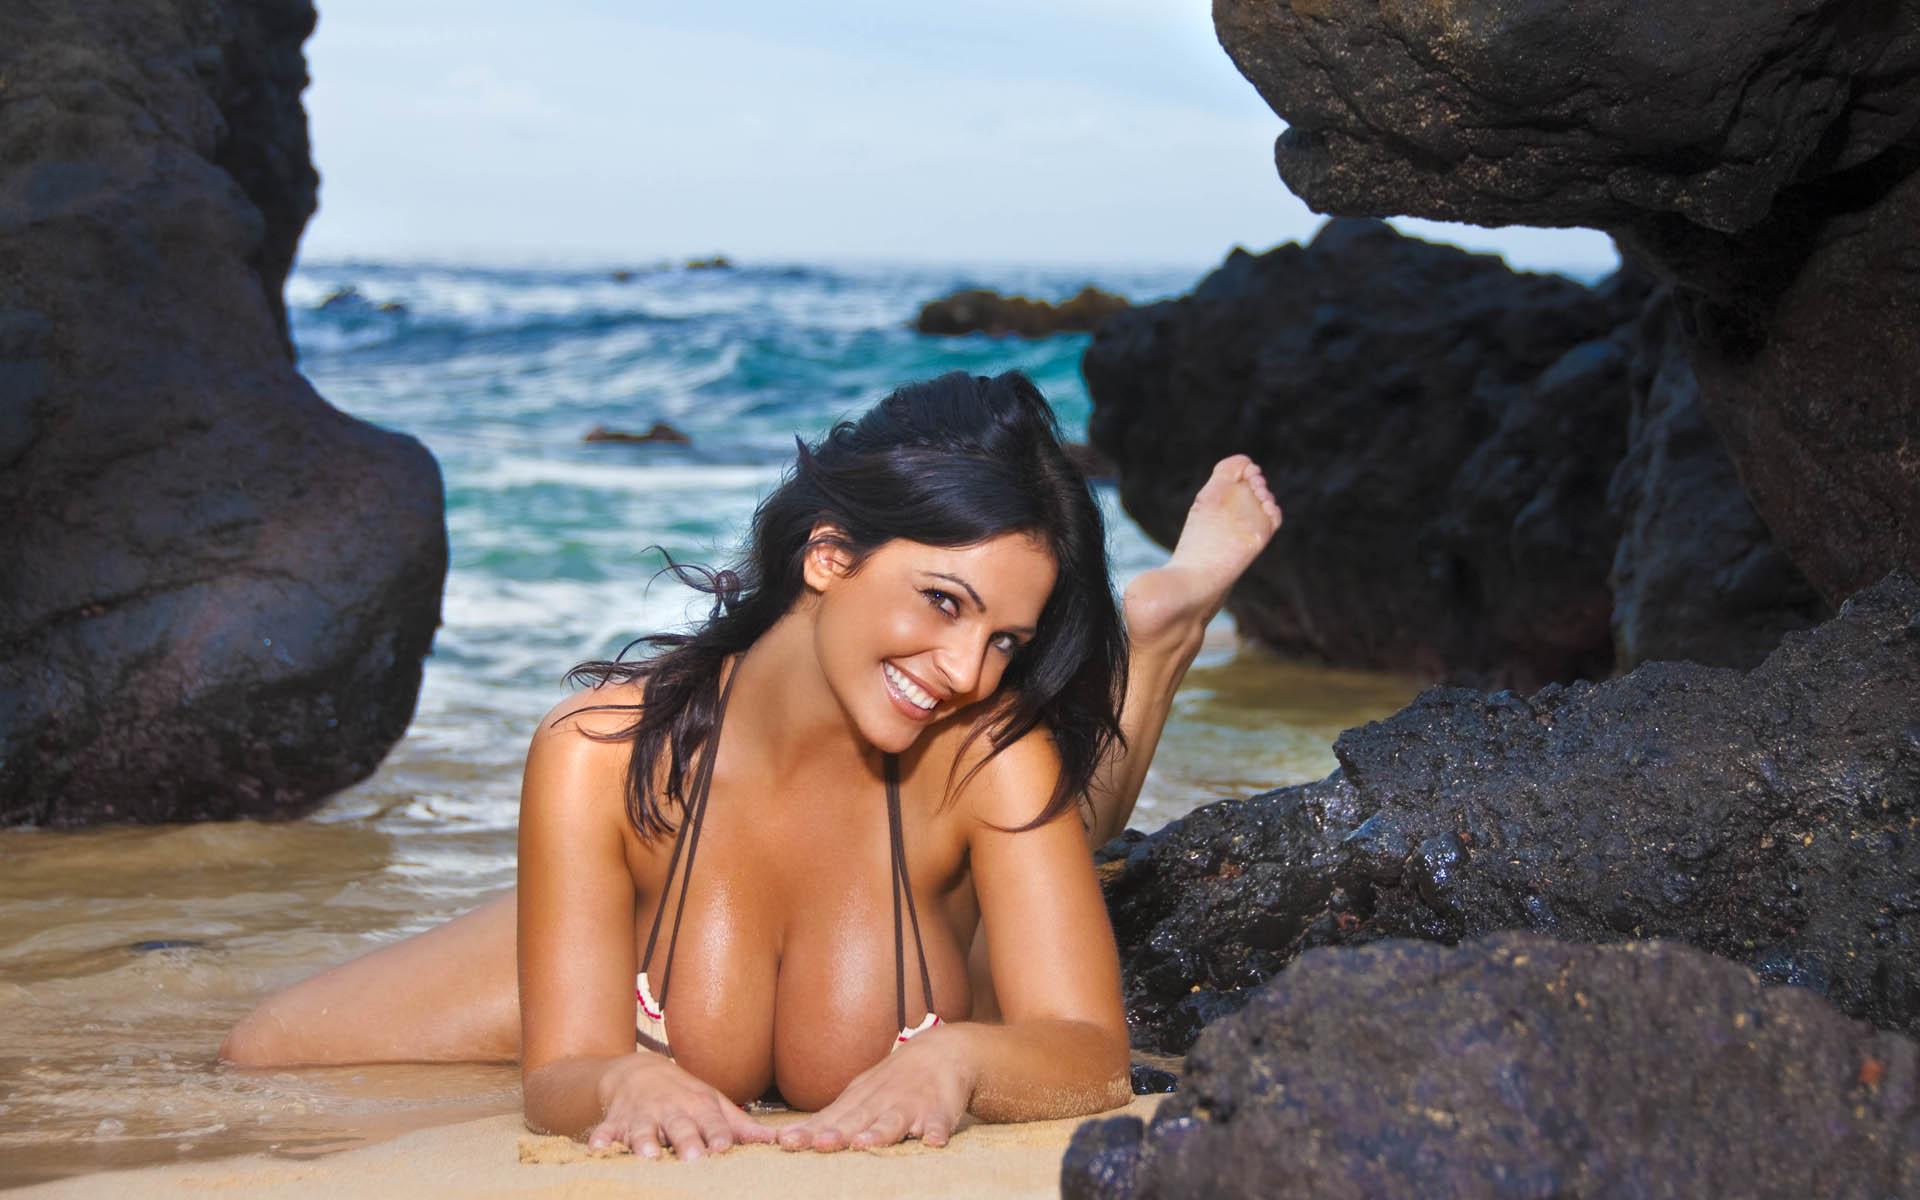 Denise milani nude gallery